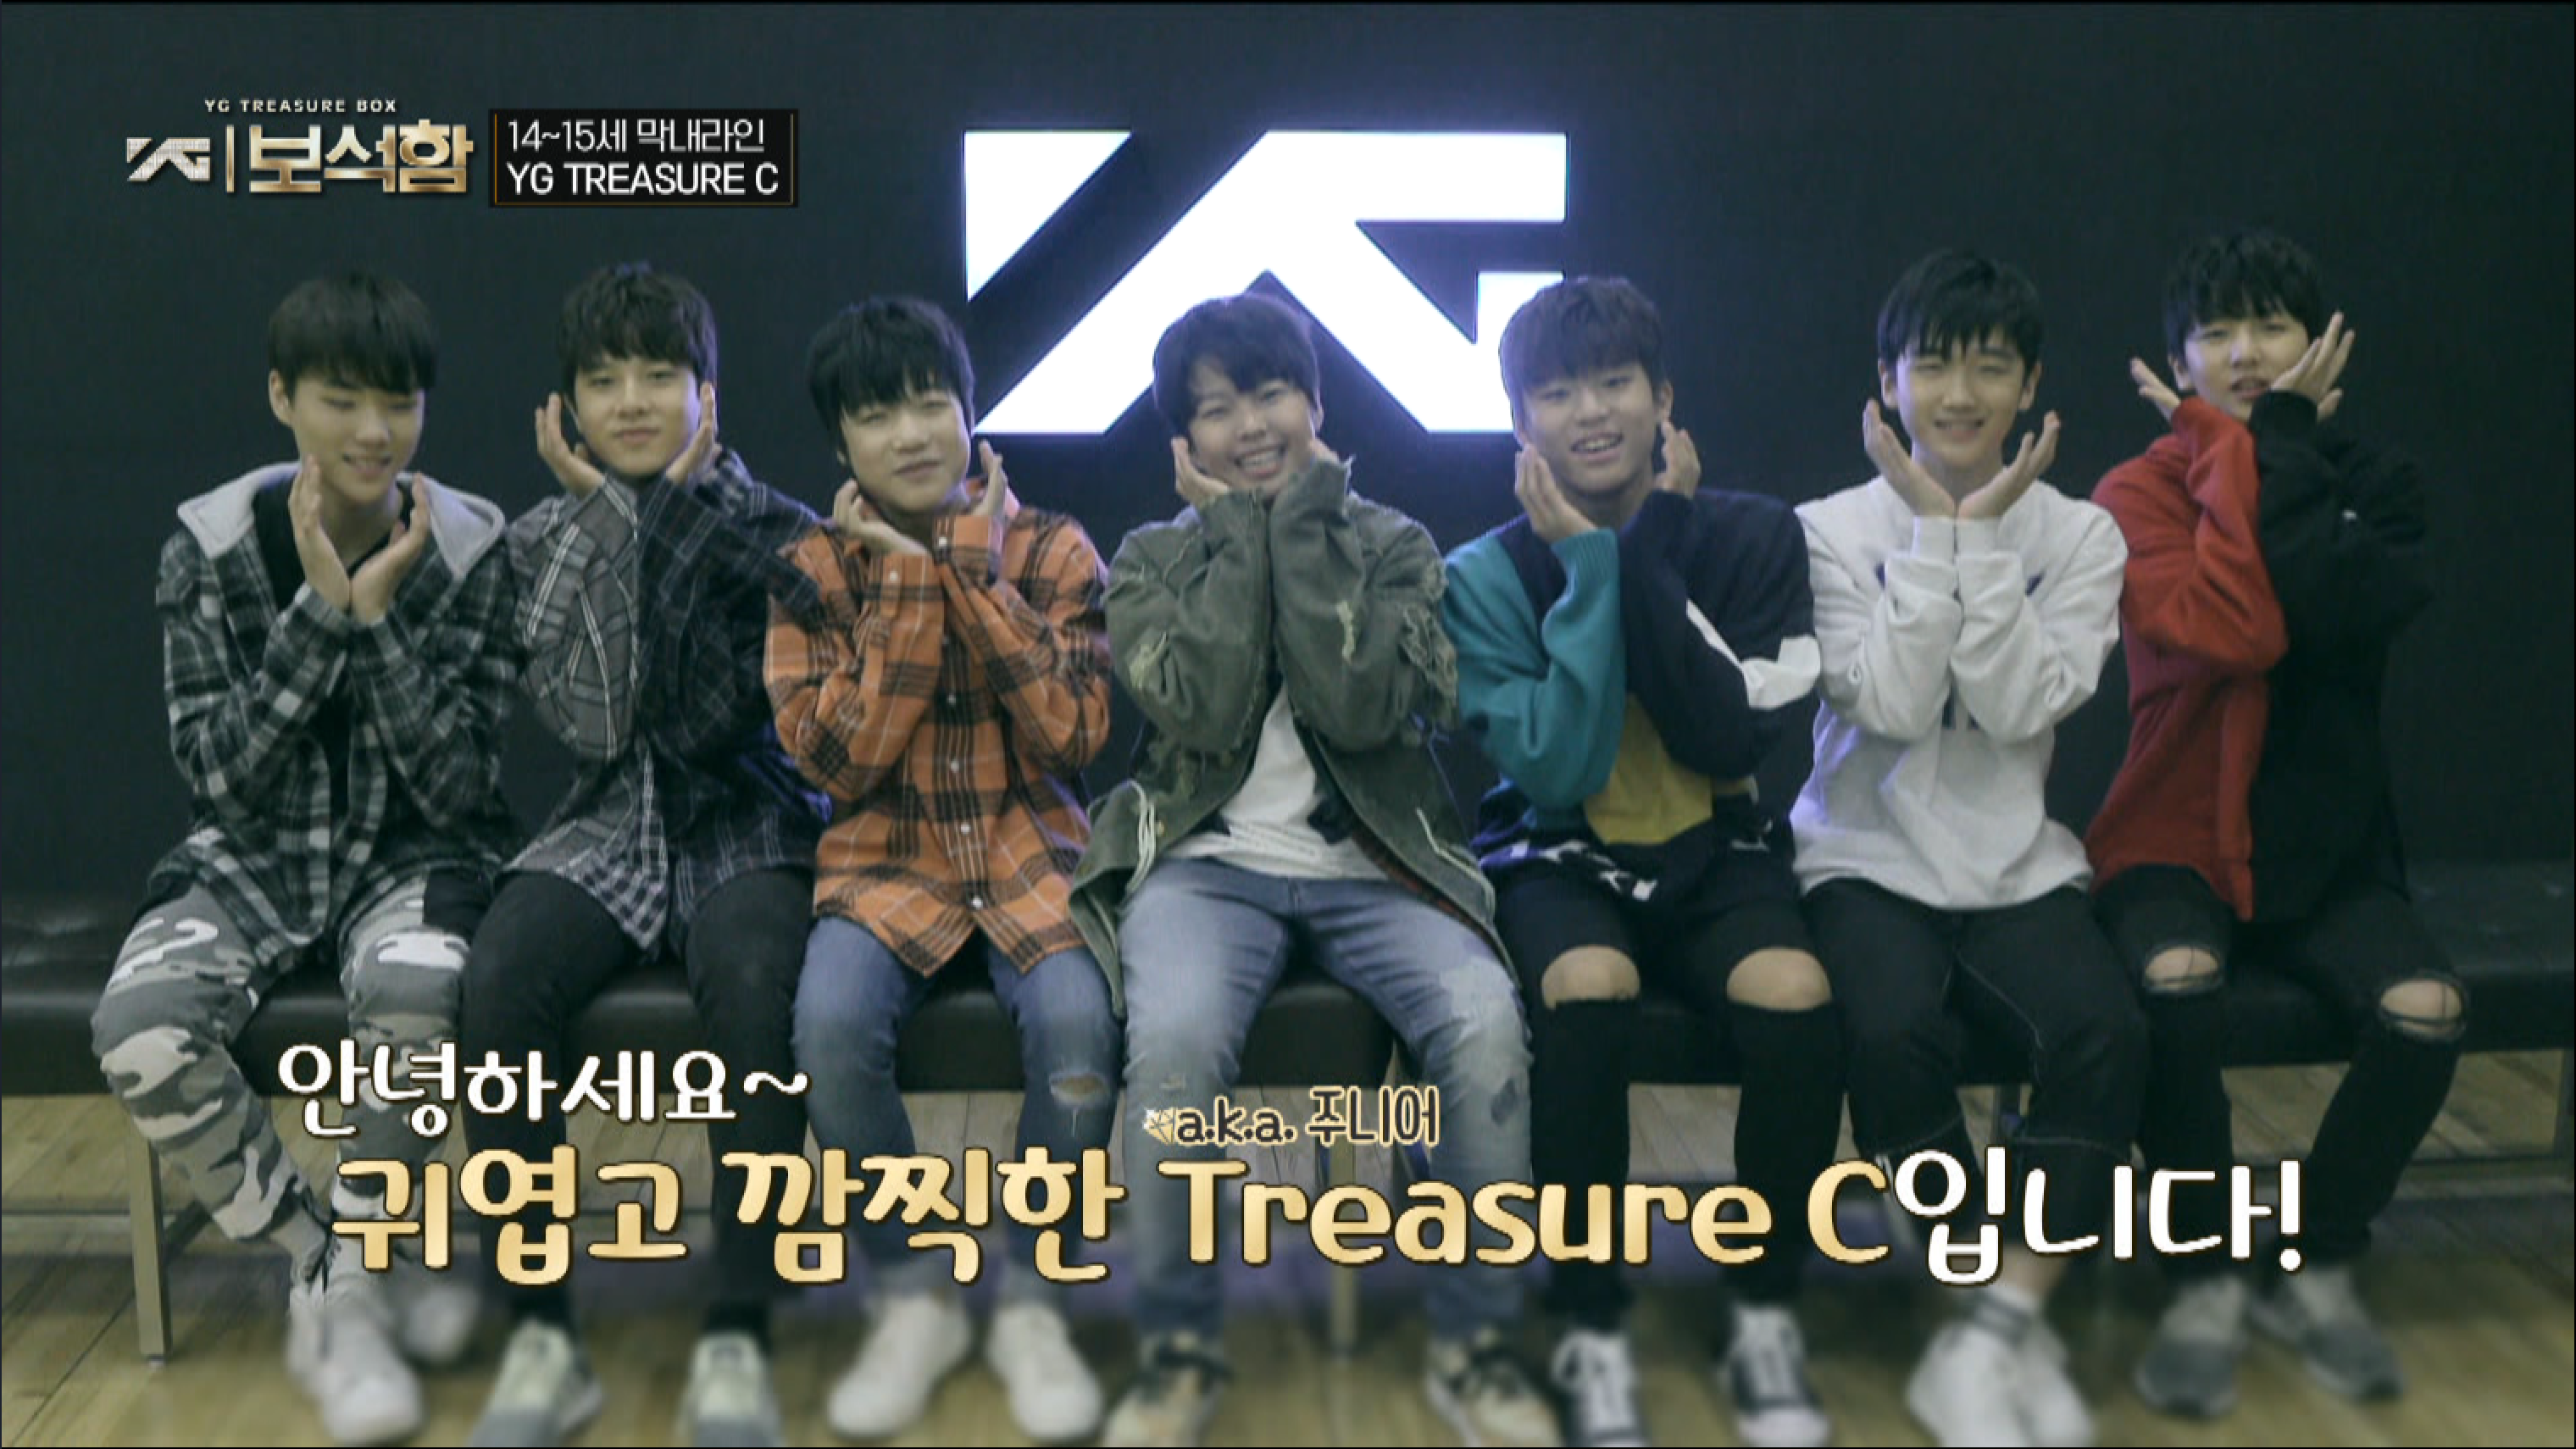 YG 보석함 EP.01| 비글미 뿜뿜, 뽀시래기 연습생들이 모인 Treasure C